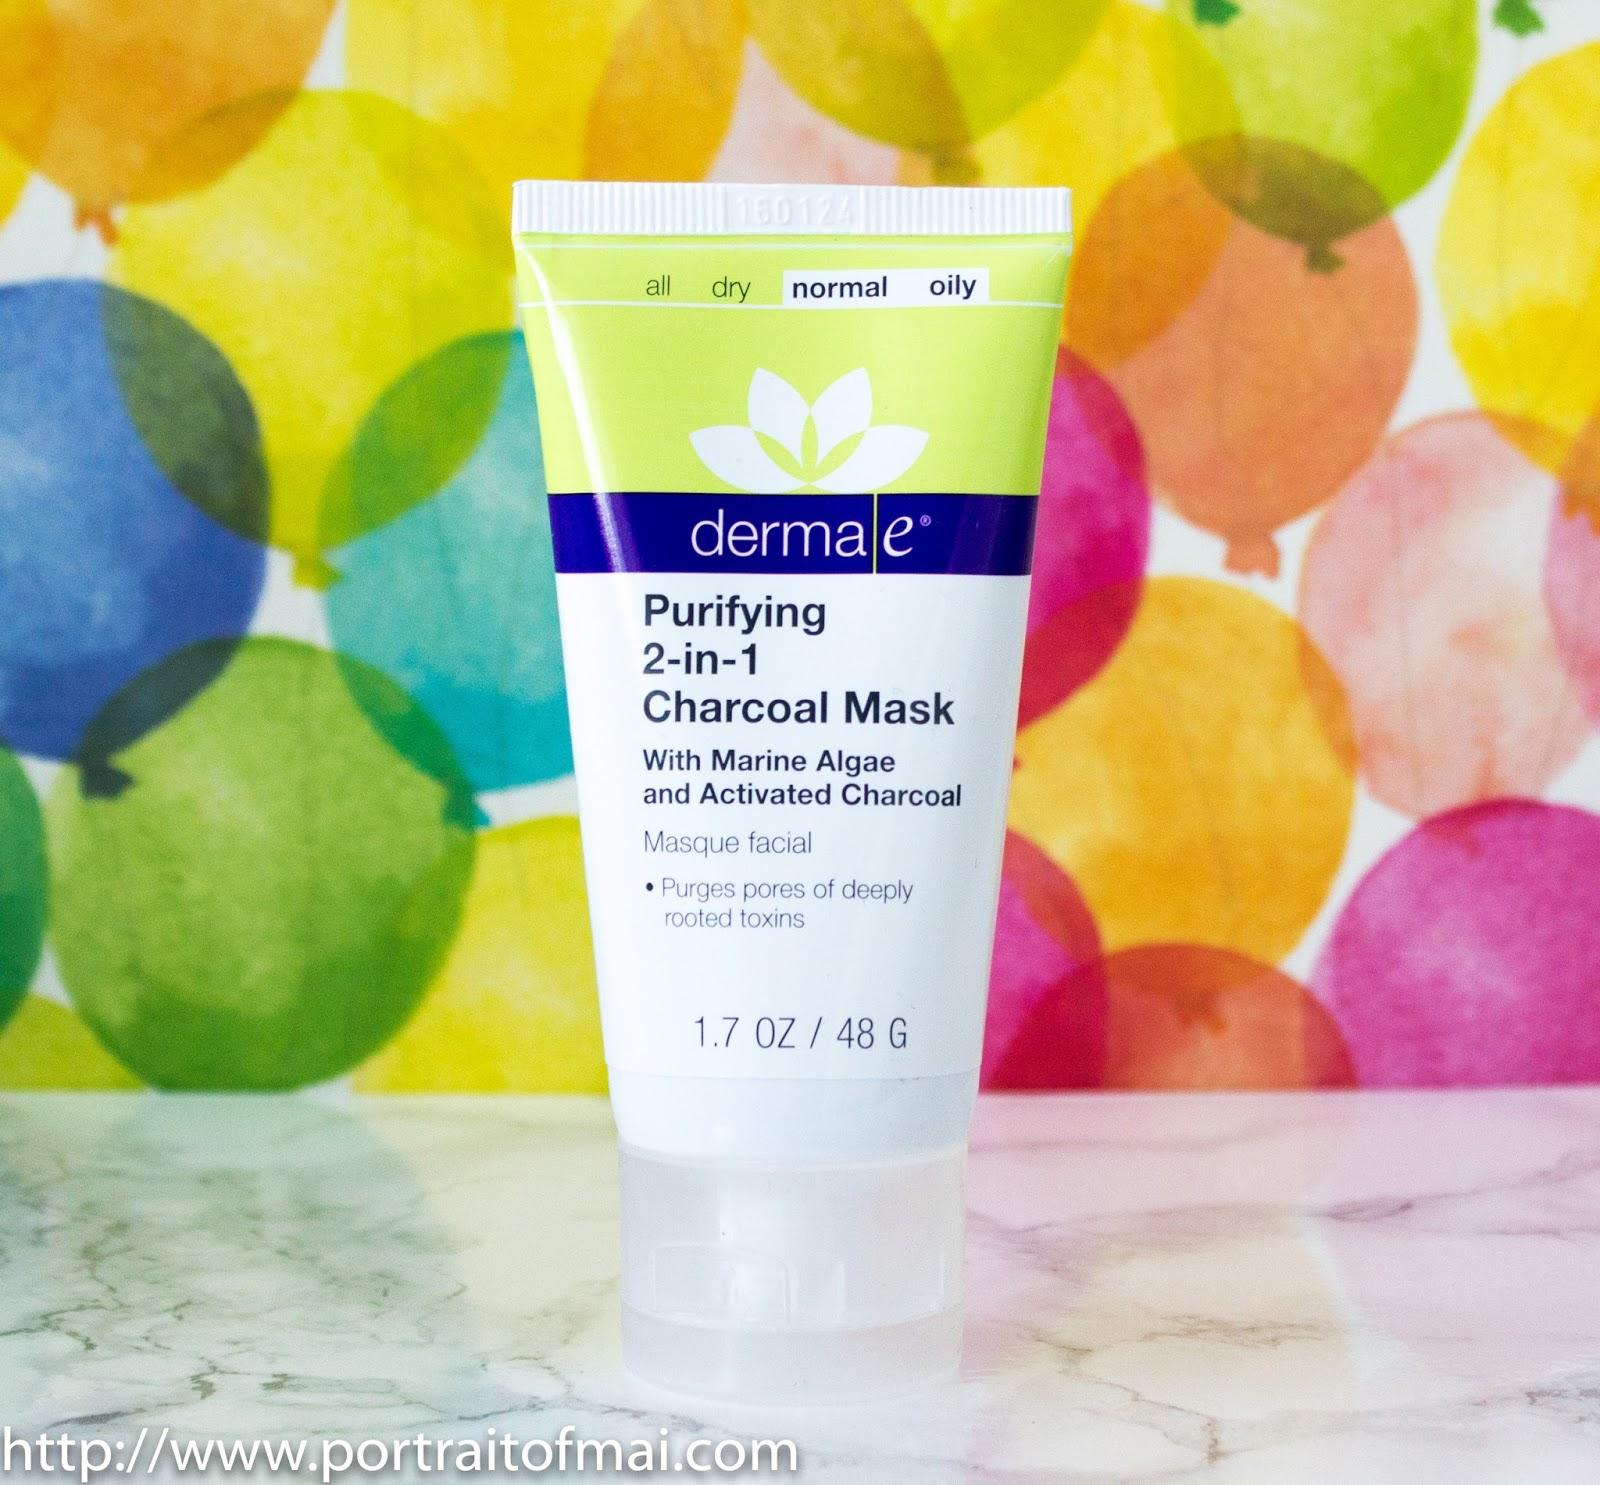 derma e purifying charcoal mask review